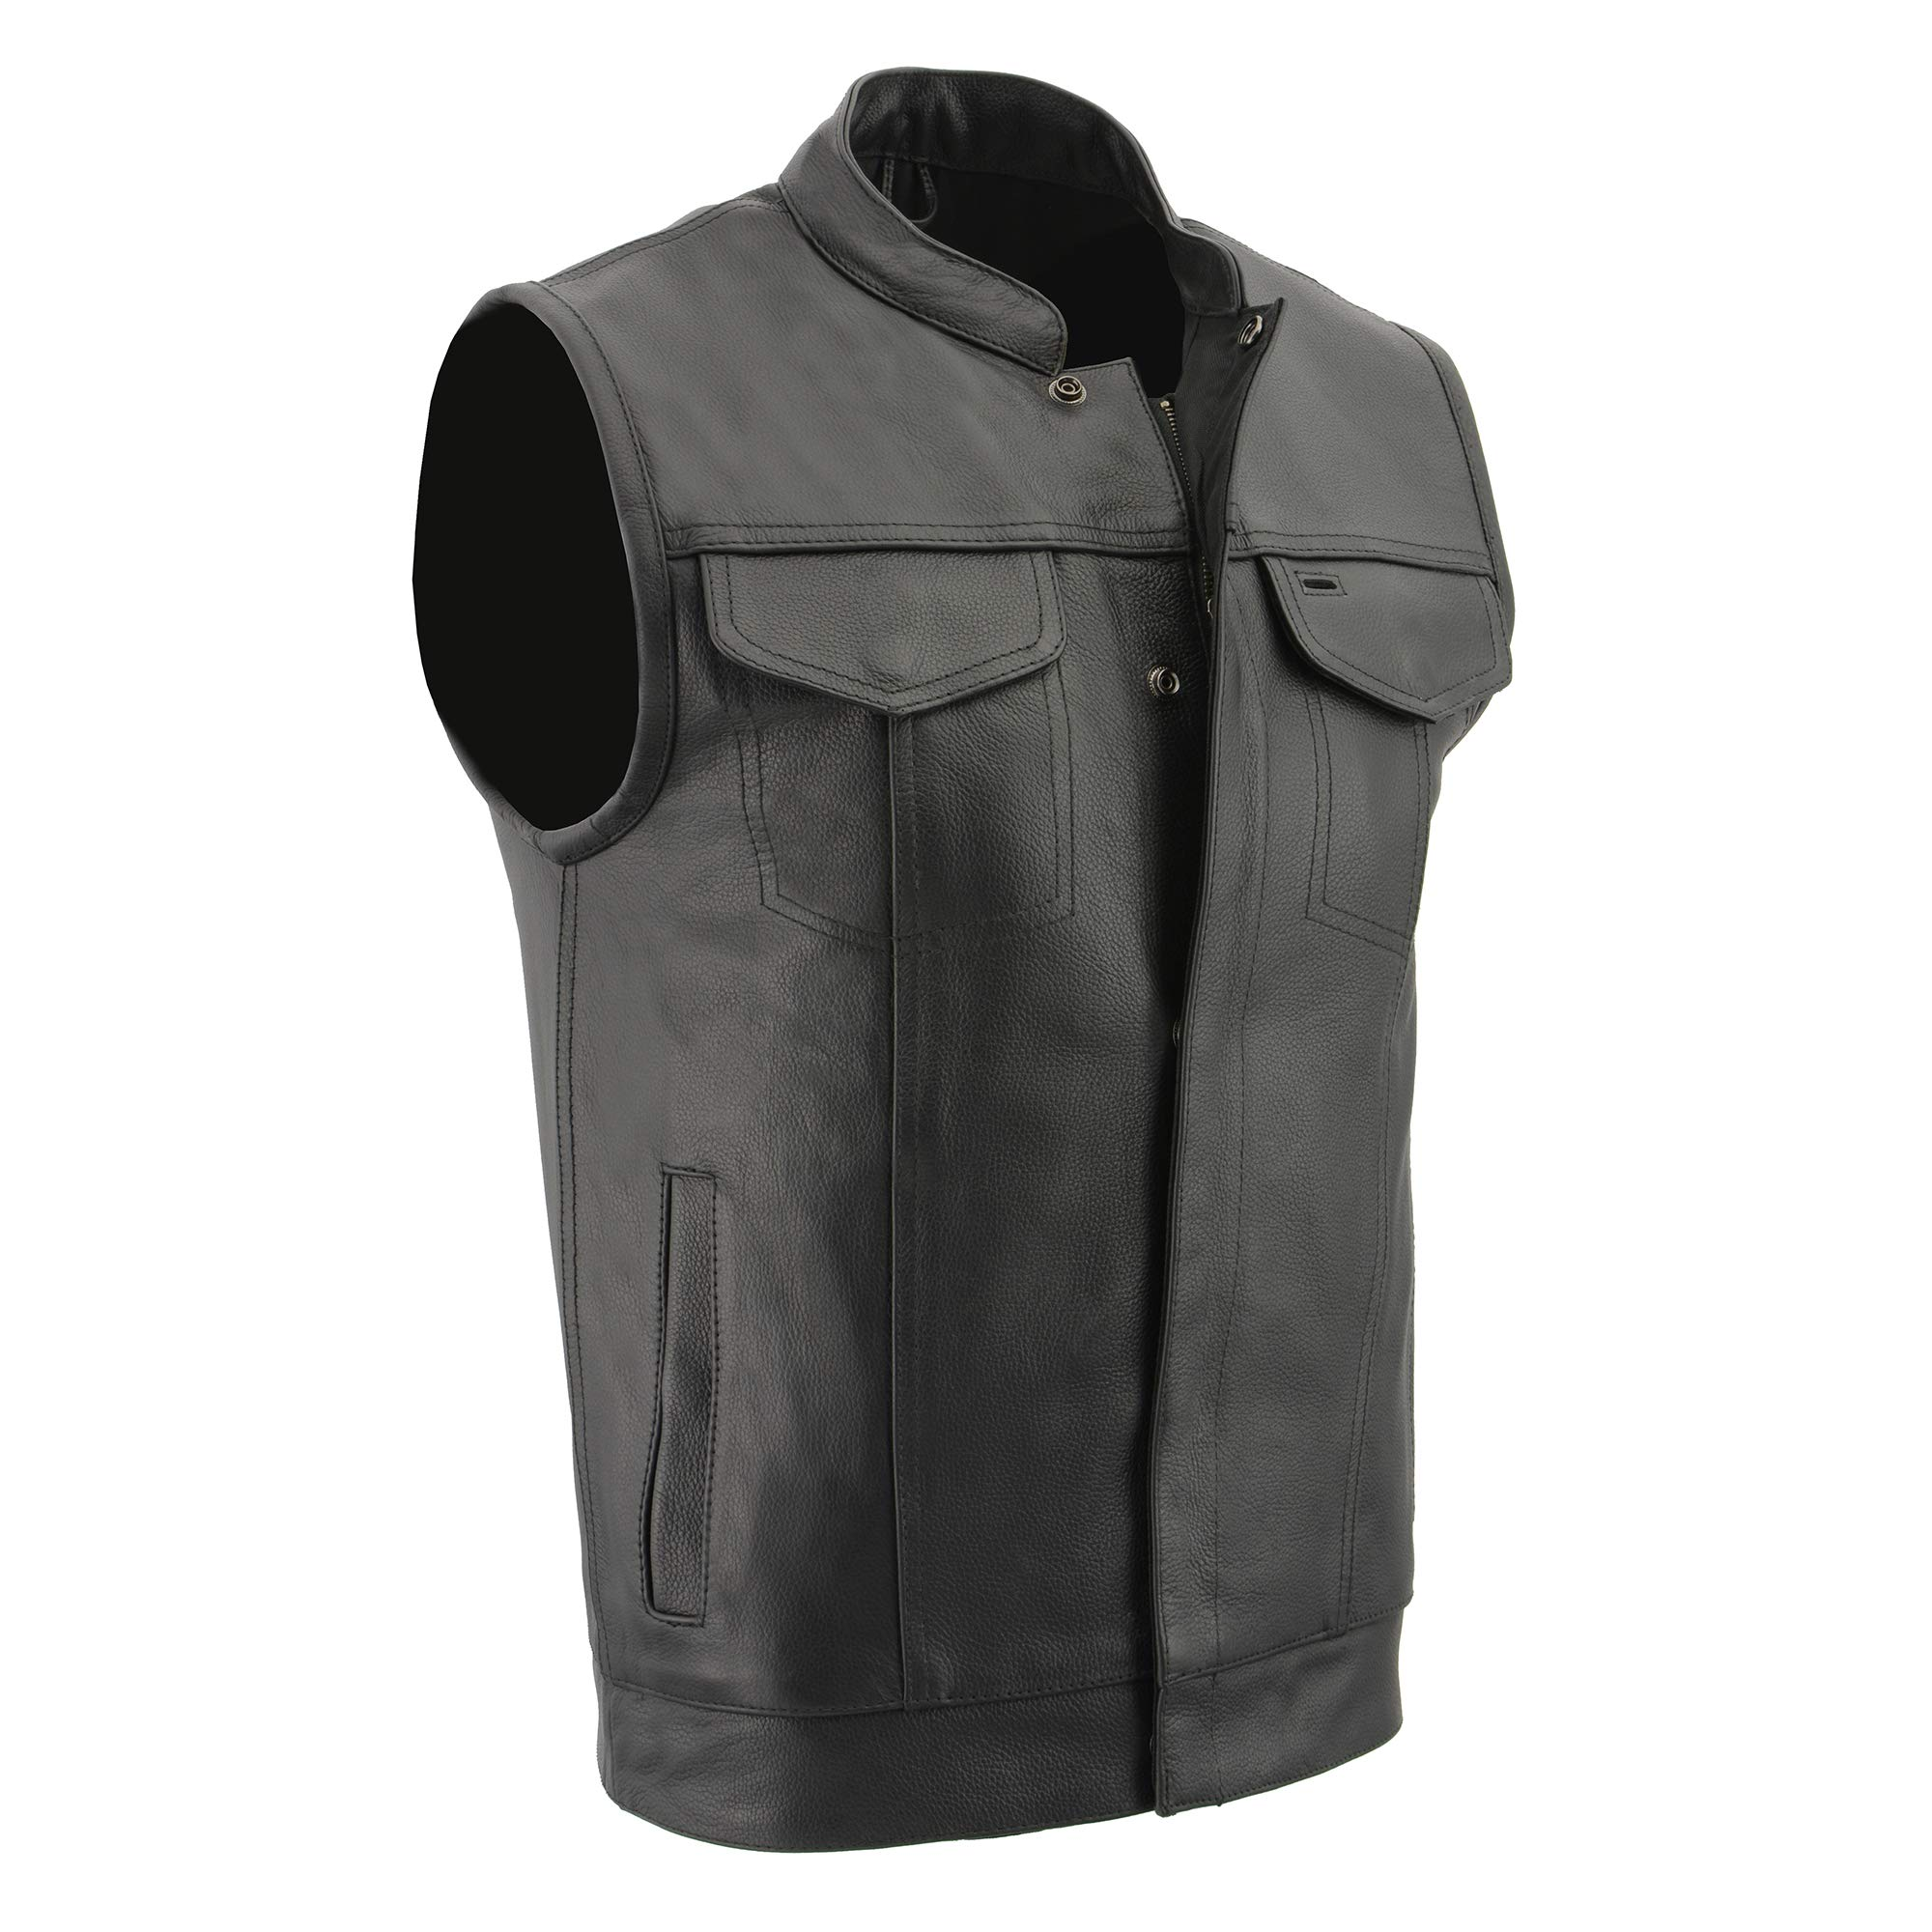 Milwaukee Leather Men's Open Neck Snap/Zip Front Club Style Vest with External Gun Pocket (Black, Large)